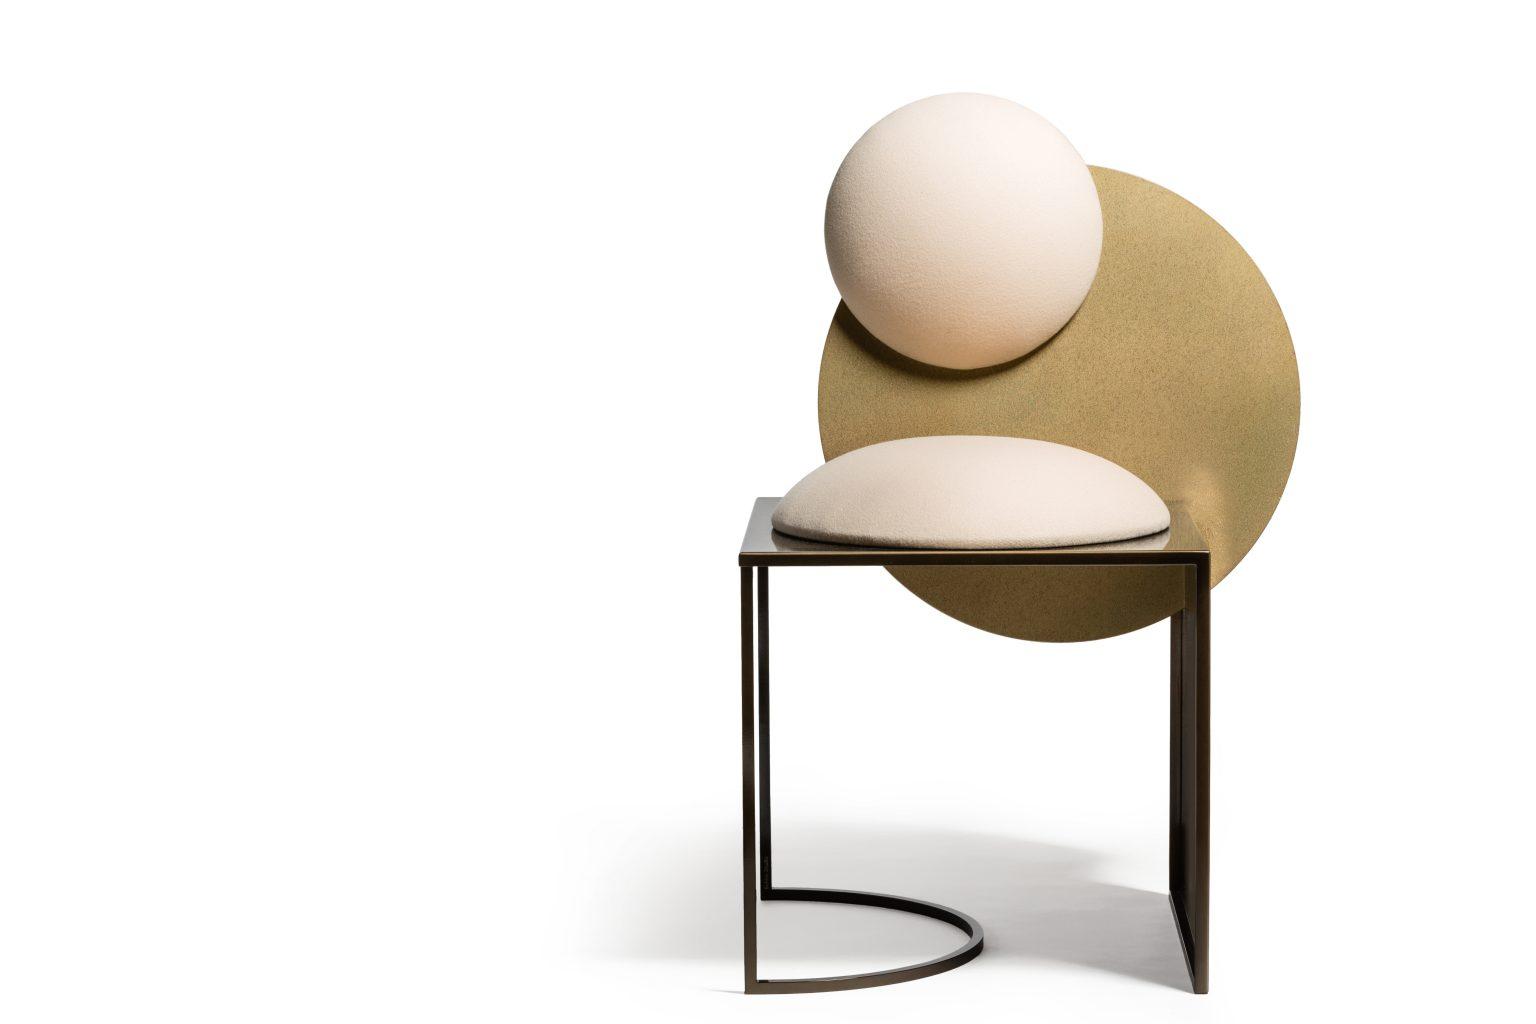 Biennale Interieur - Belgium's leading design and interior event - Bohinc-studio-celeste-chair-black-and-brass-03.jpg